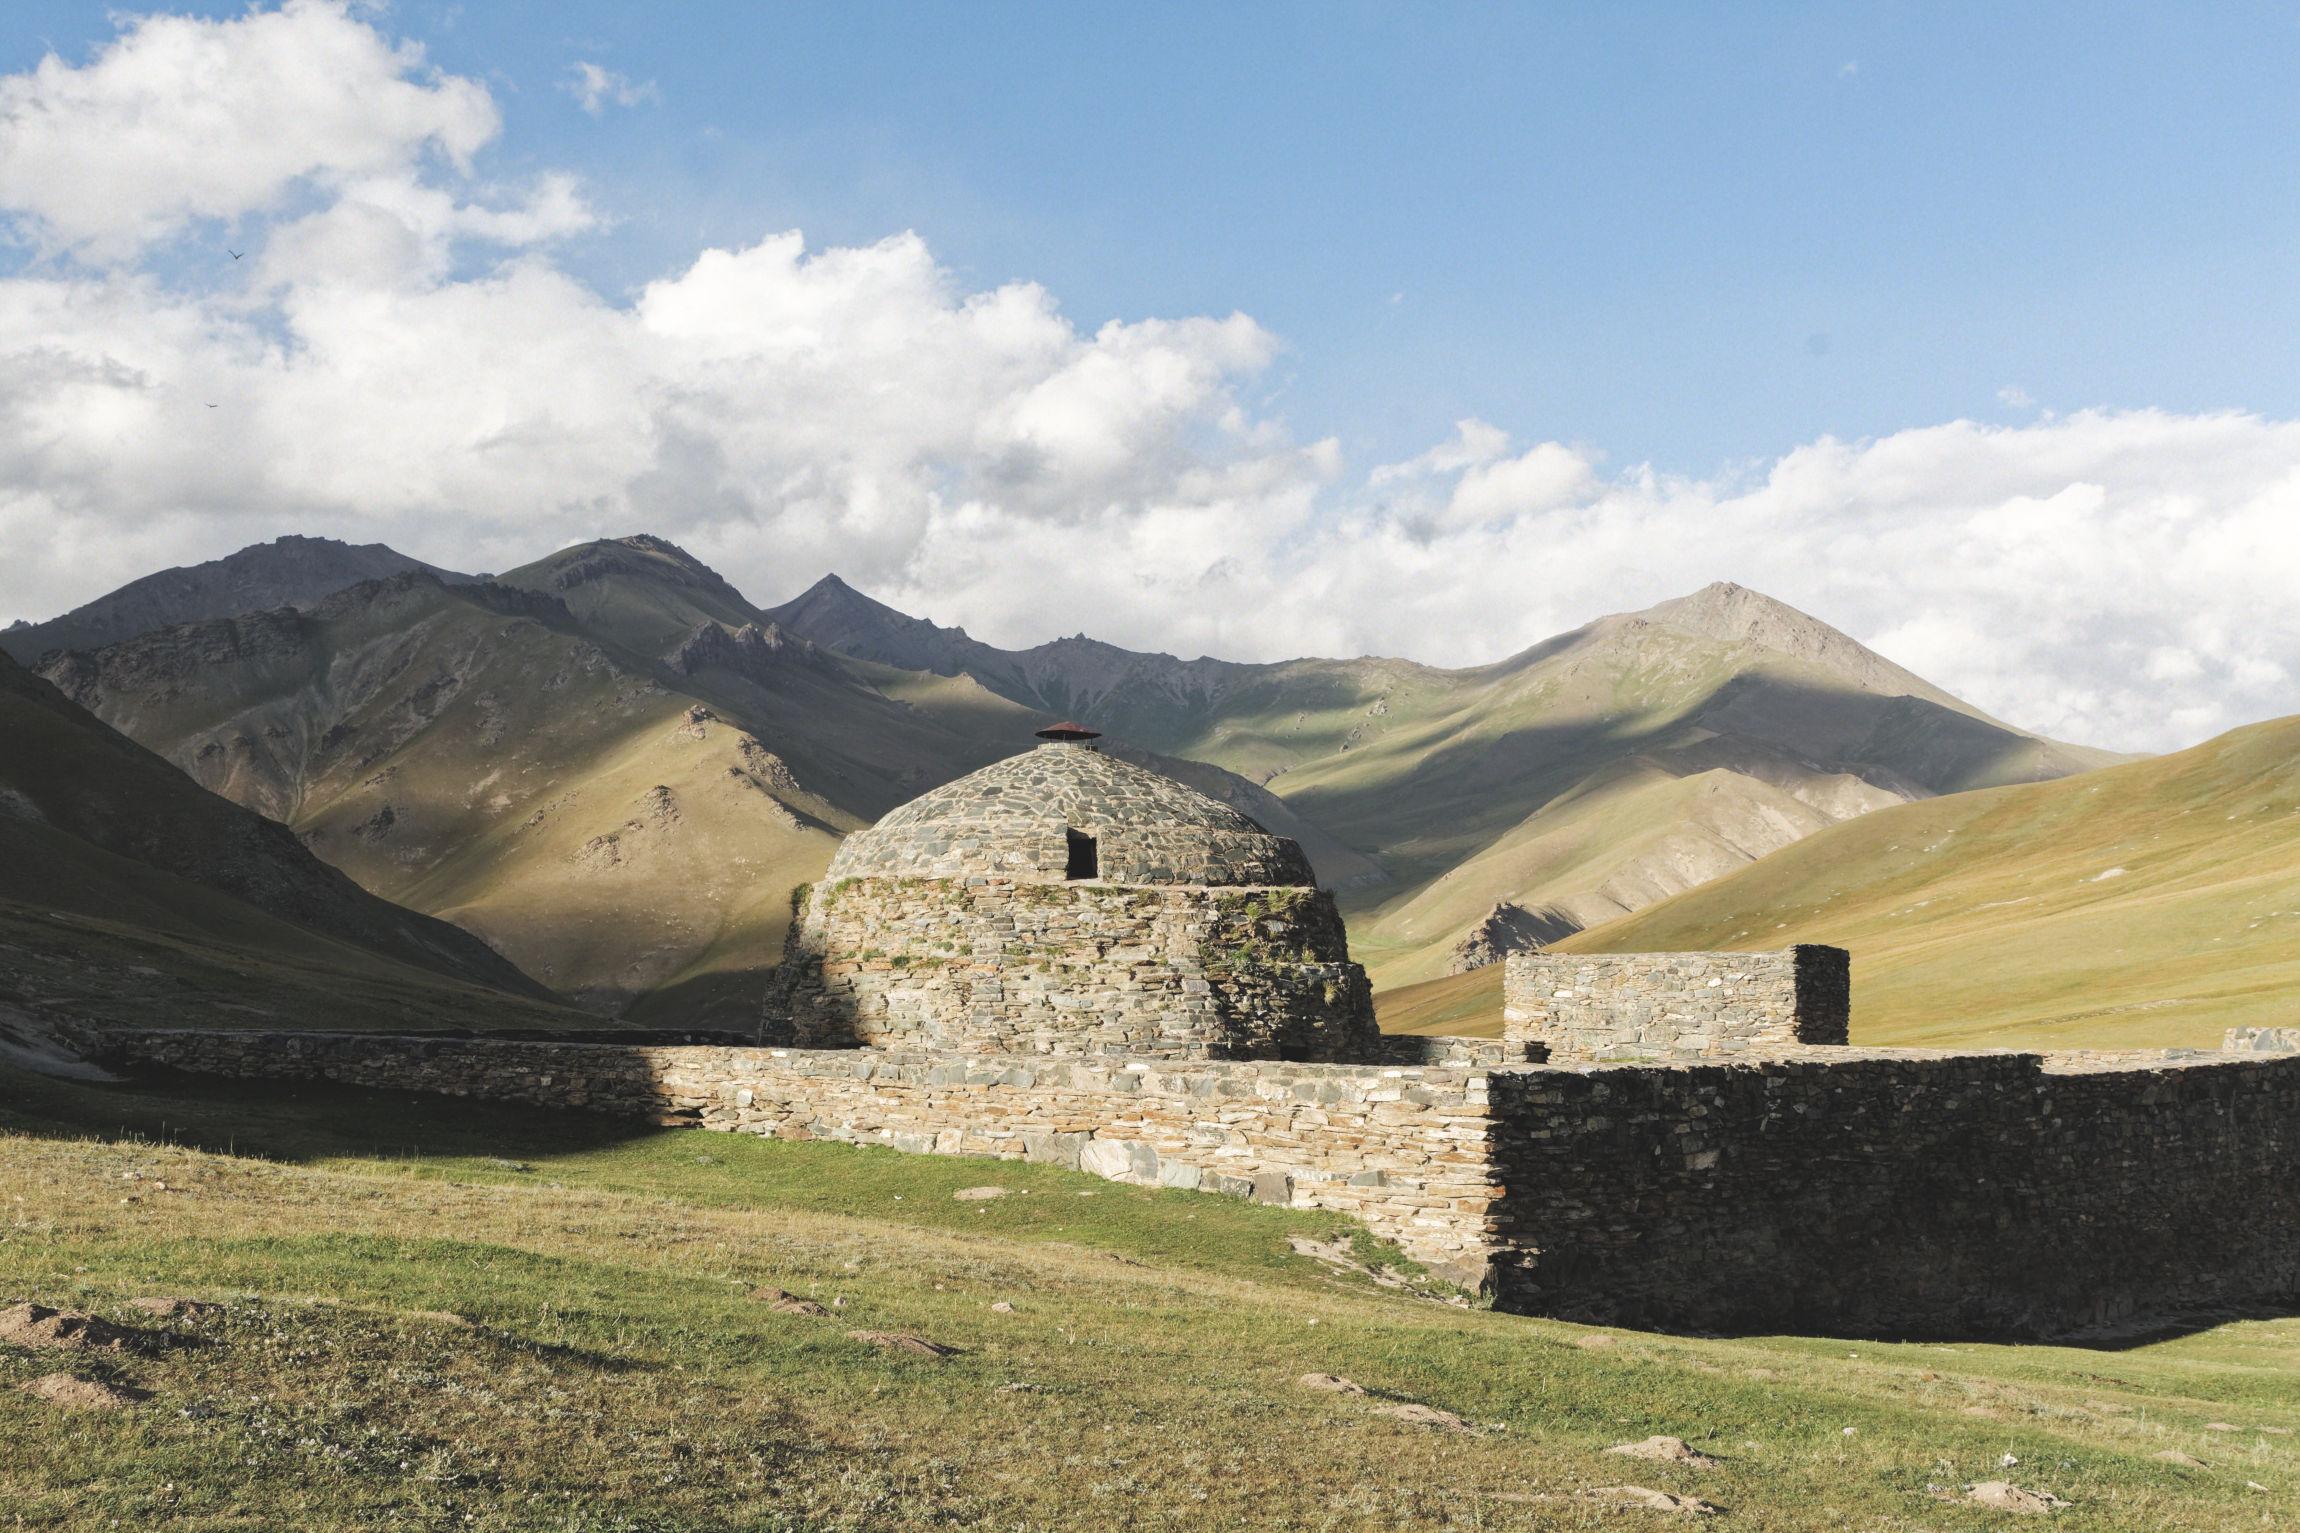 Caravansérail de Tash Rabat Kirghizstan